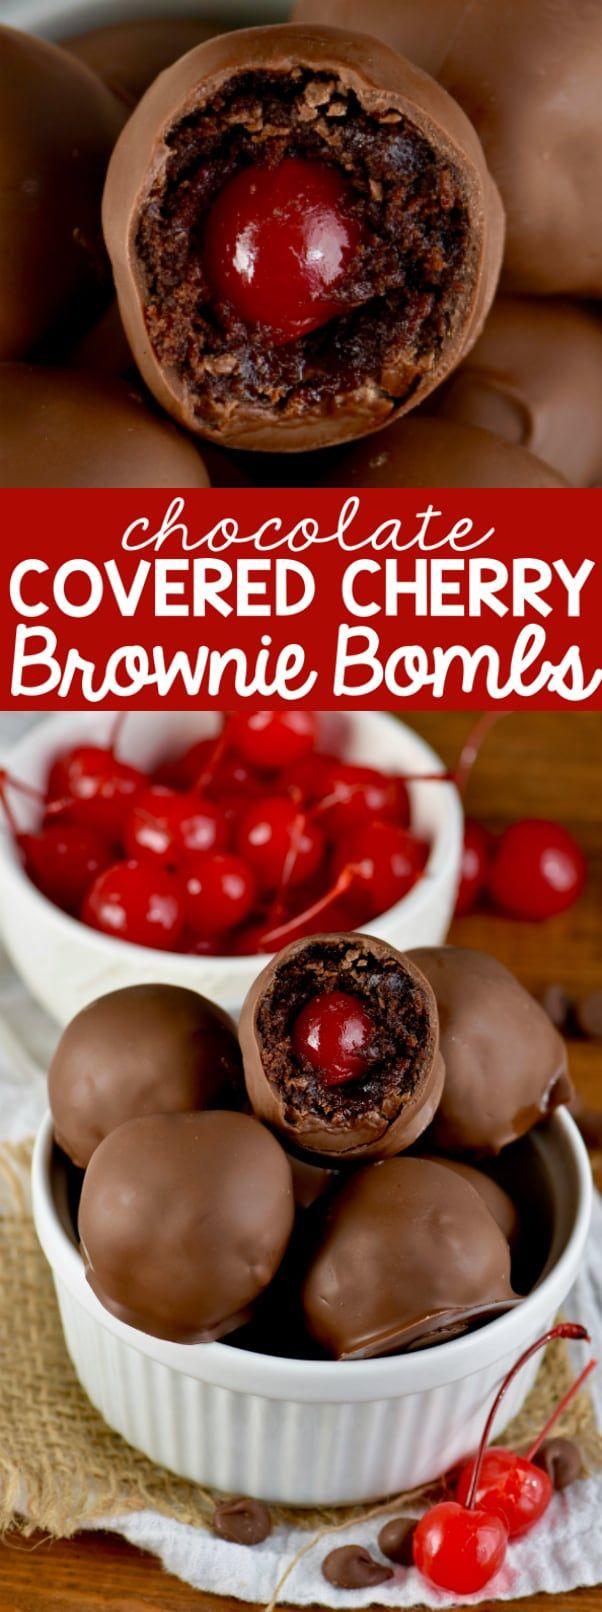 Chocolate Covered Cherry Brownie Bombs Cherry Brownies Chocolate Covered Cherries Dessert Recipes